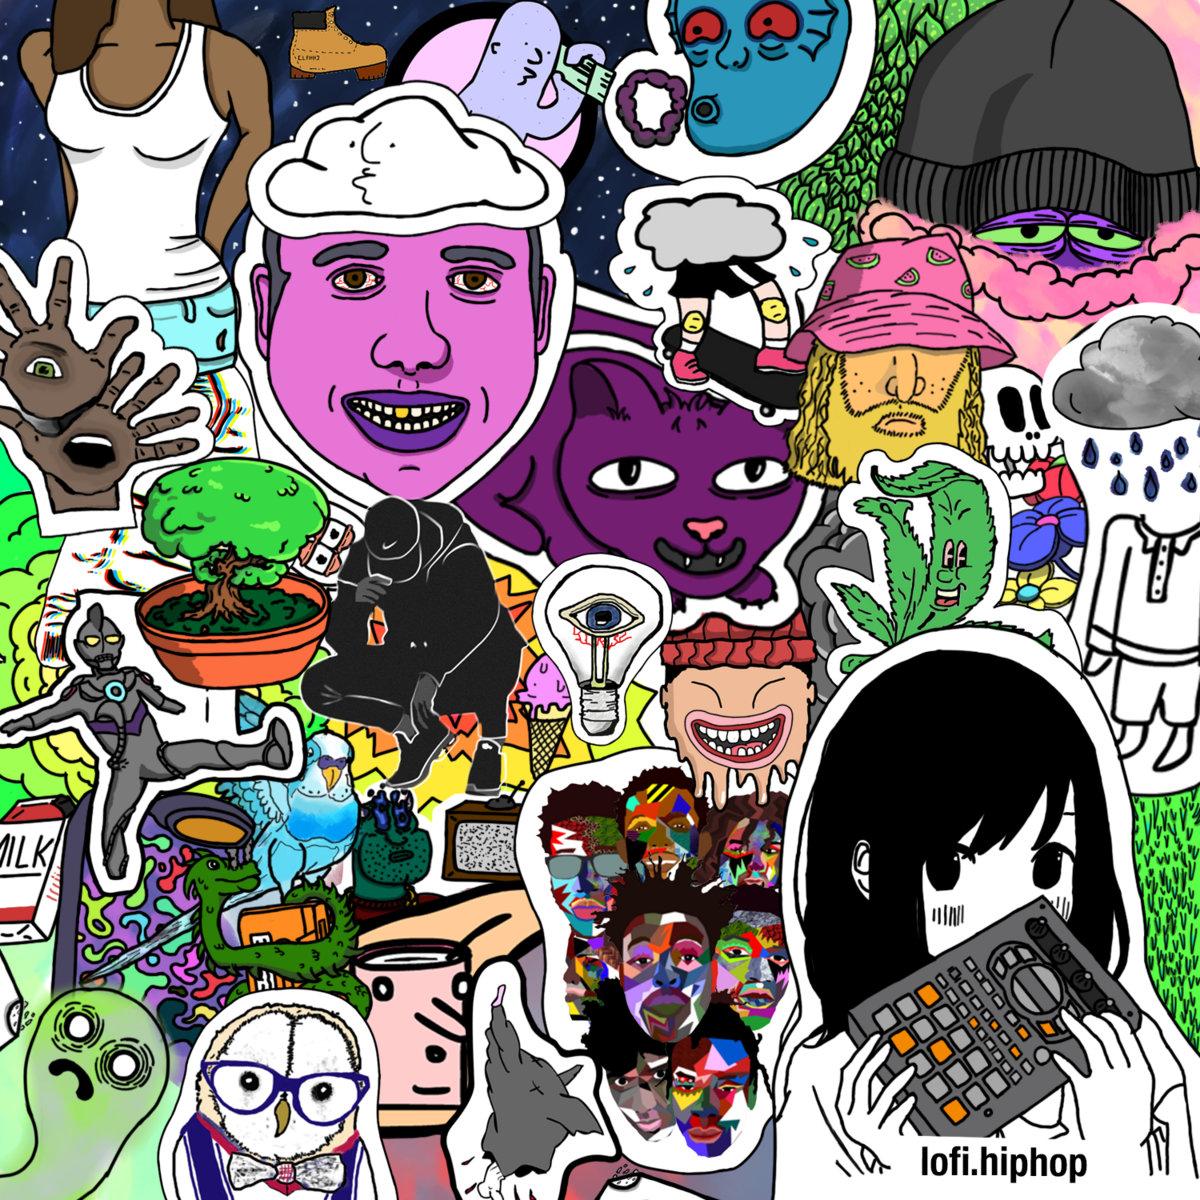 lofi hiphop [ 002 ] | lofi hiphop